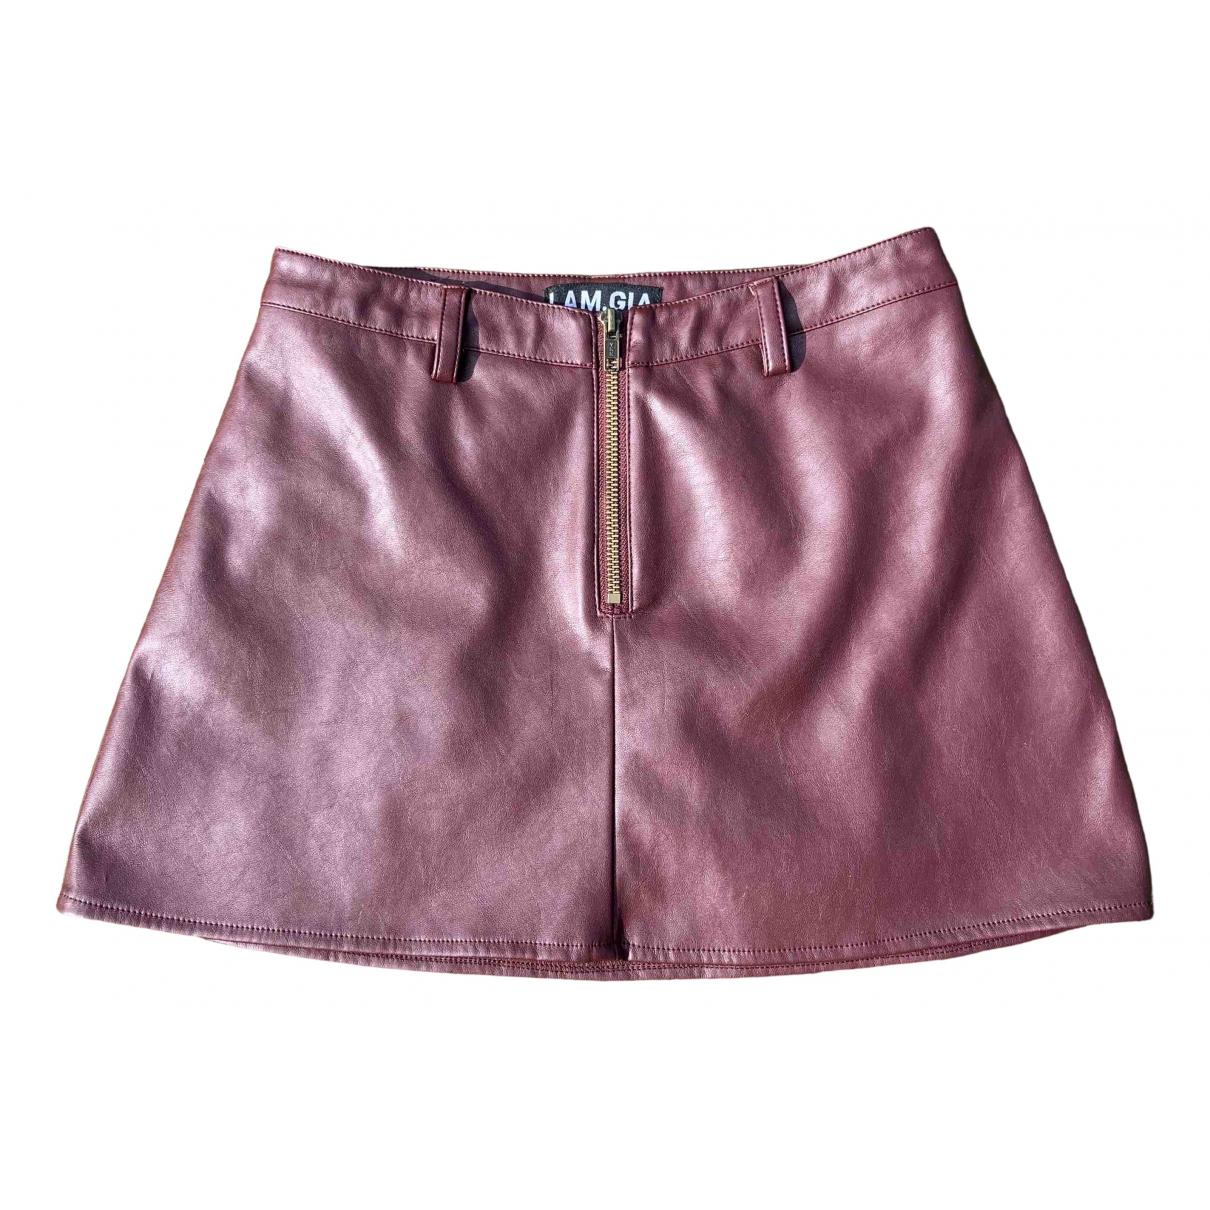 Mini falda de Cuero I.am.gia